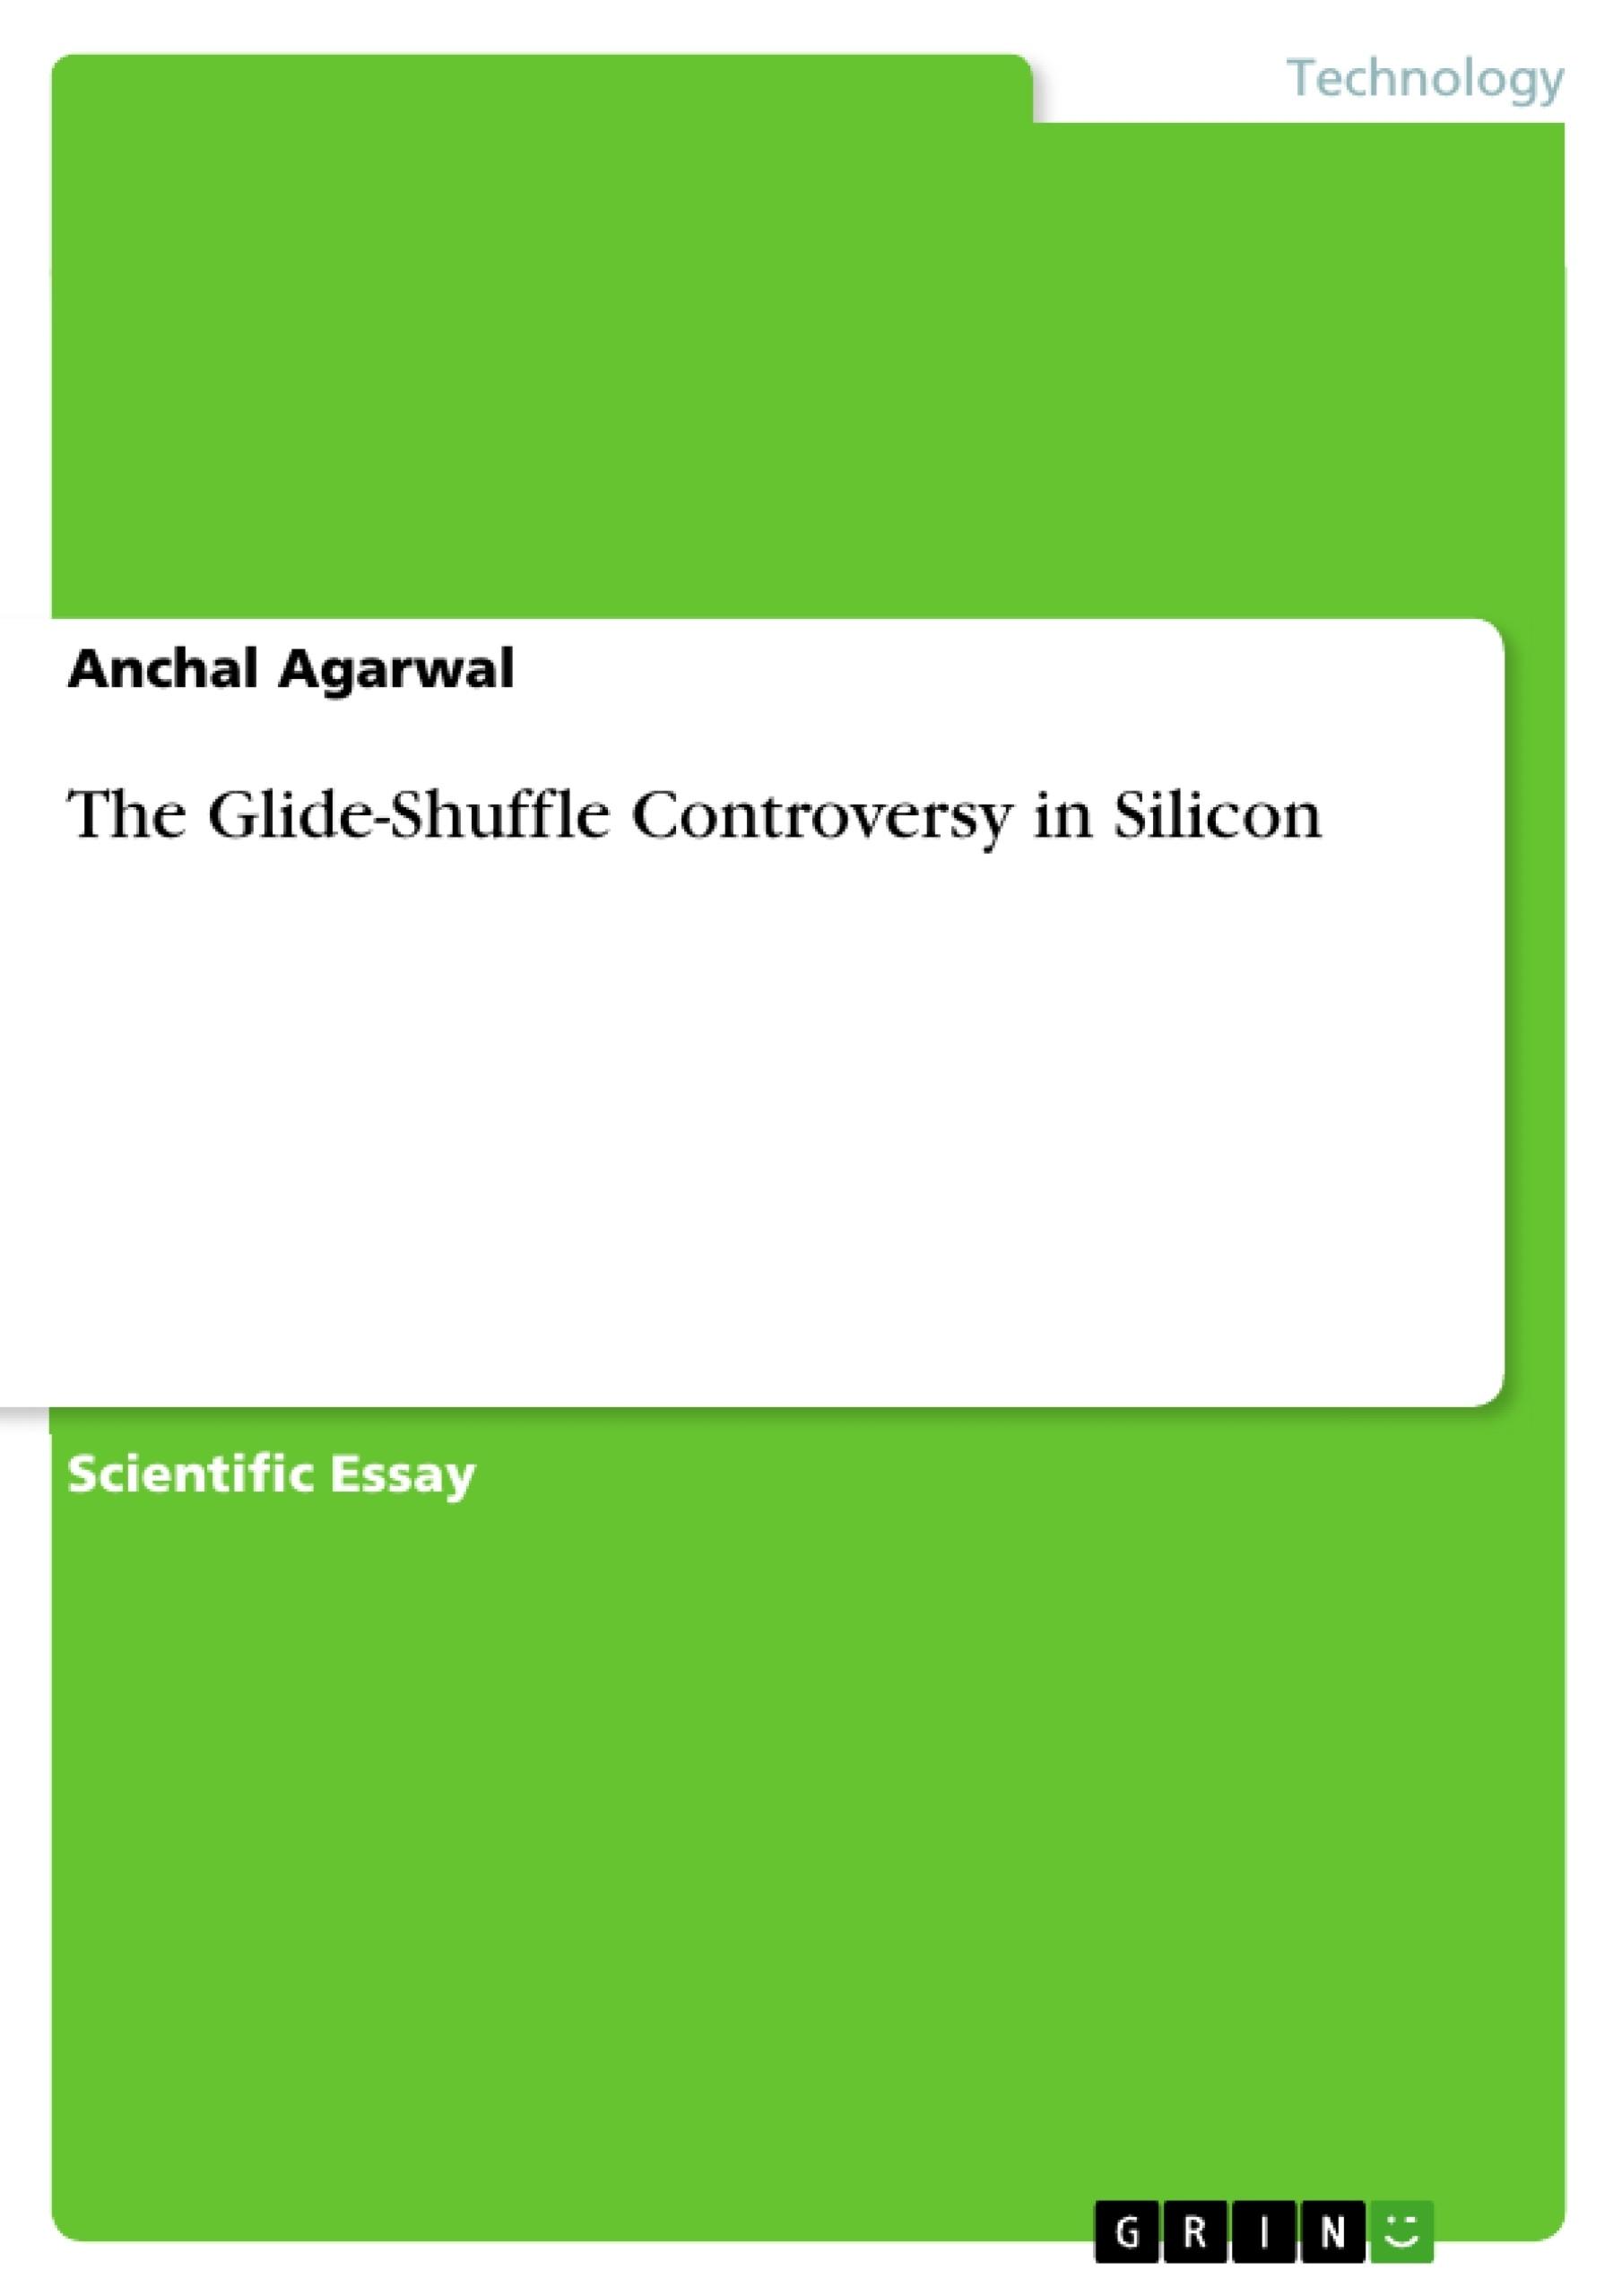 Title: The Glide-Shuffle Controversy in Silicon